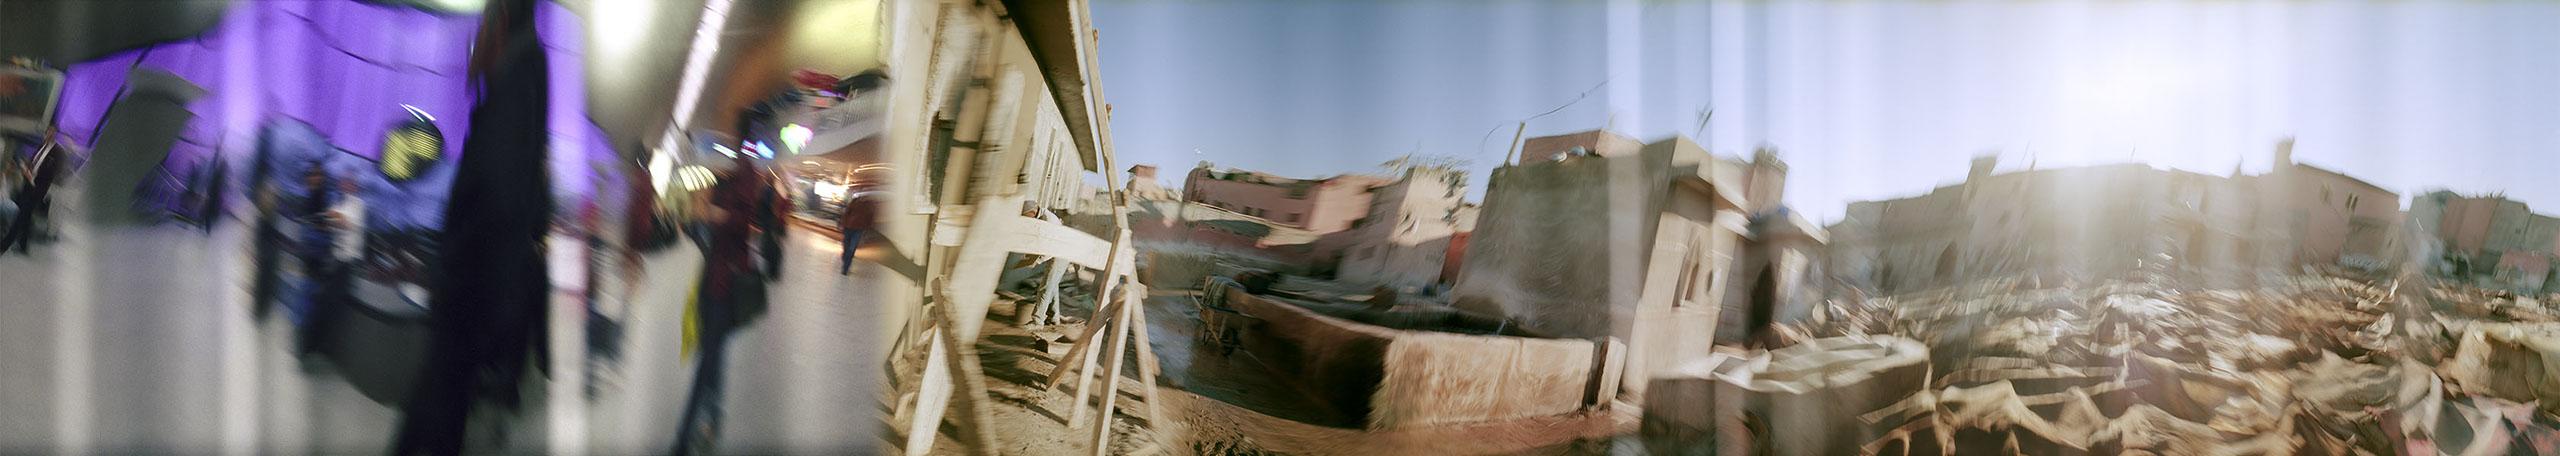 RAK Marrakesh